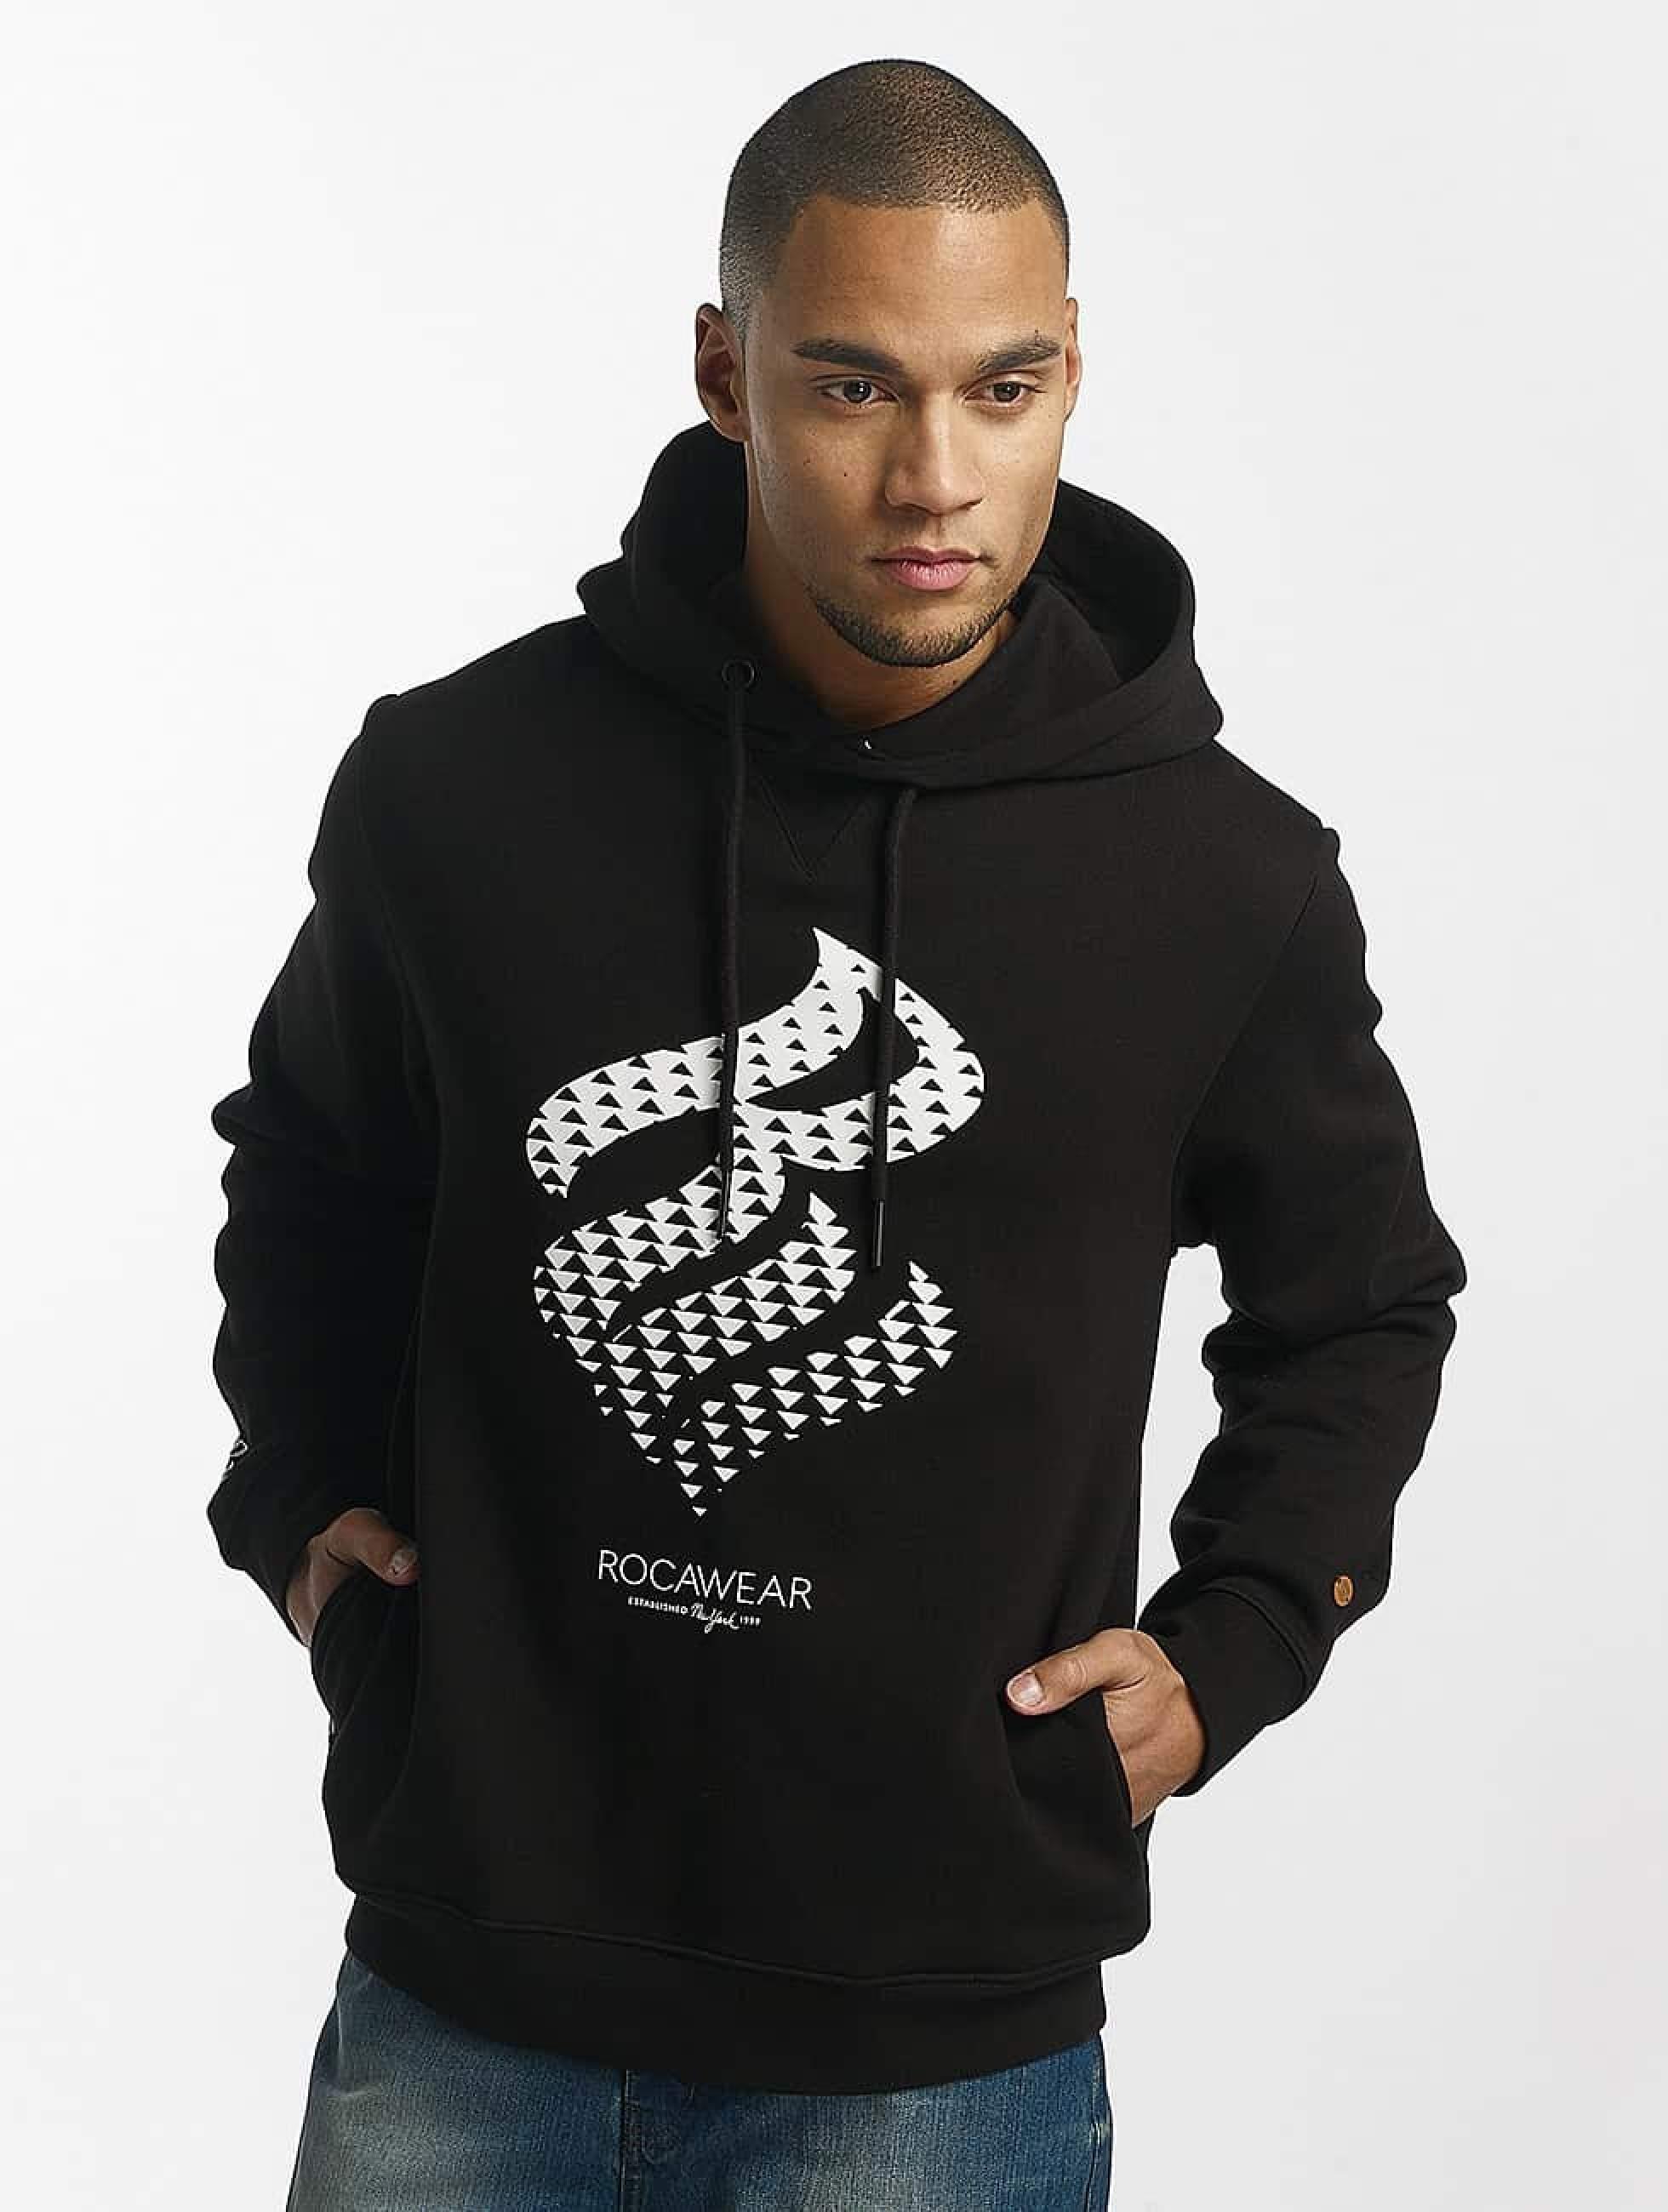 Rocawear / Hoodie Triangle in black M